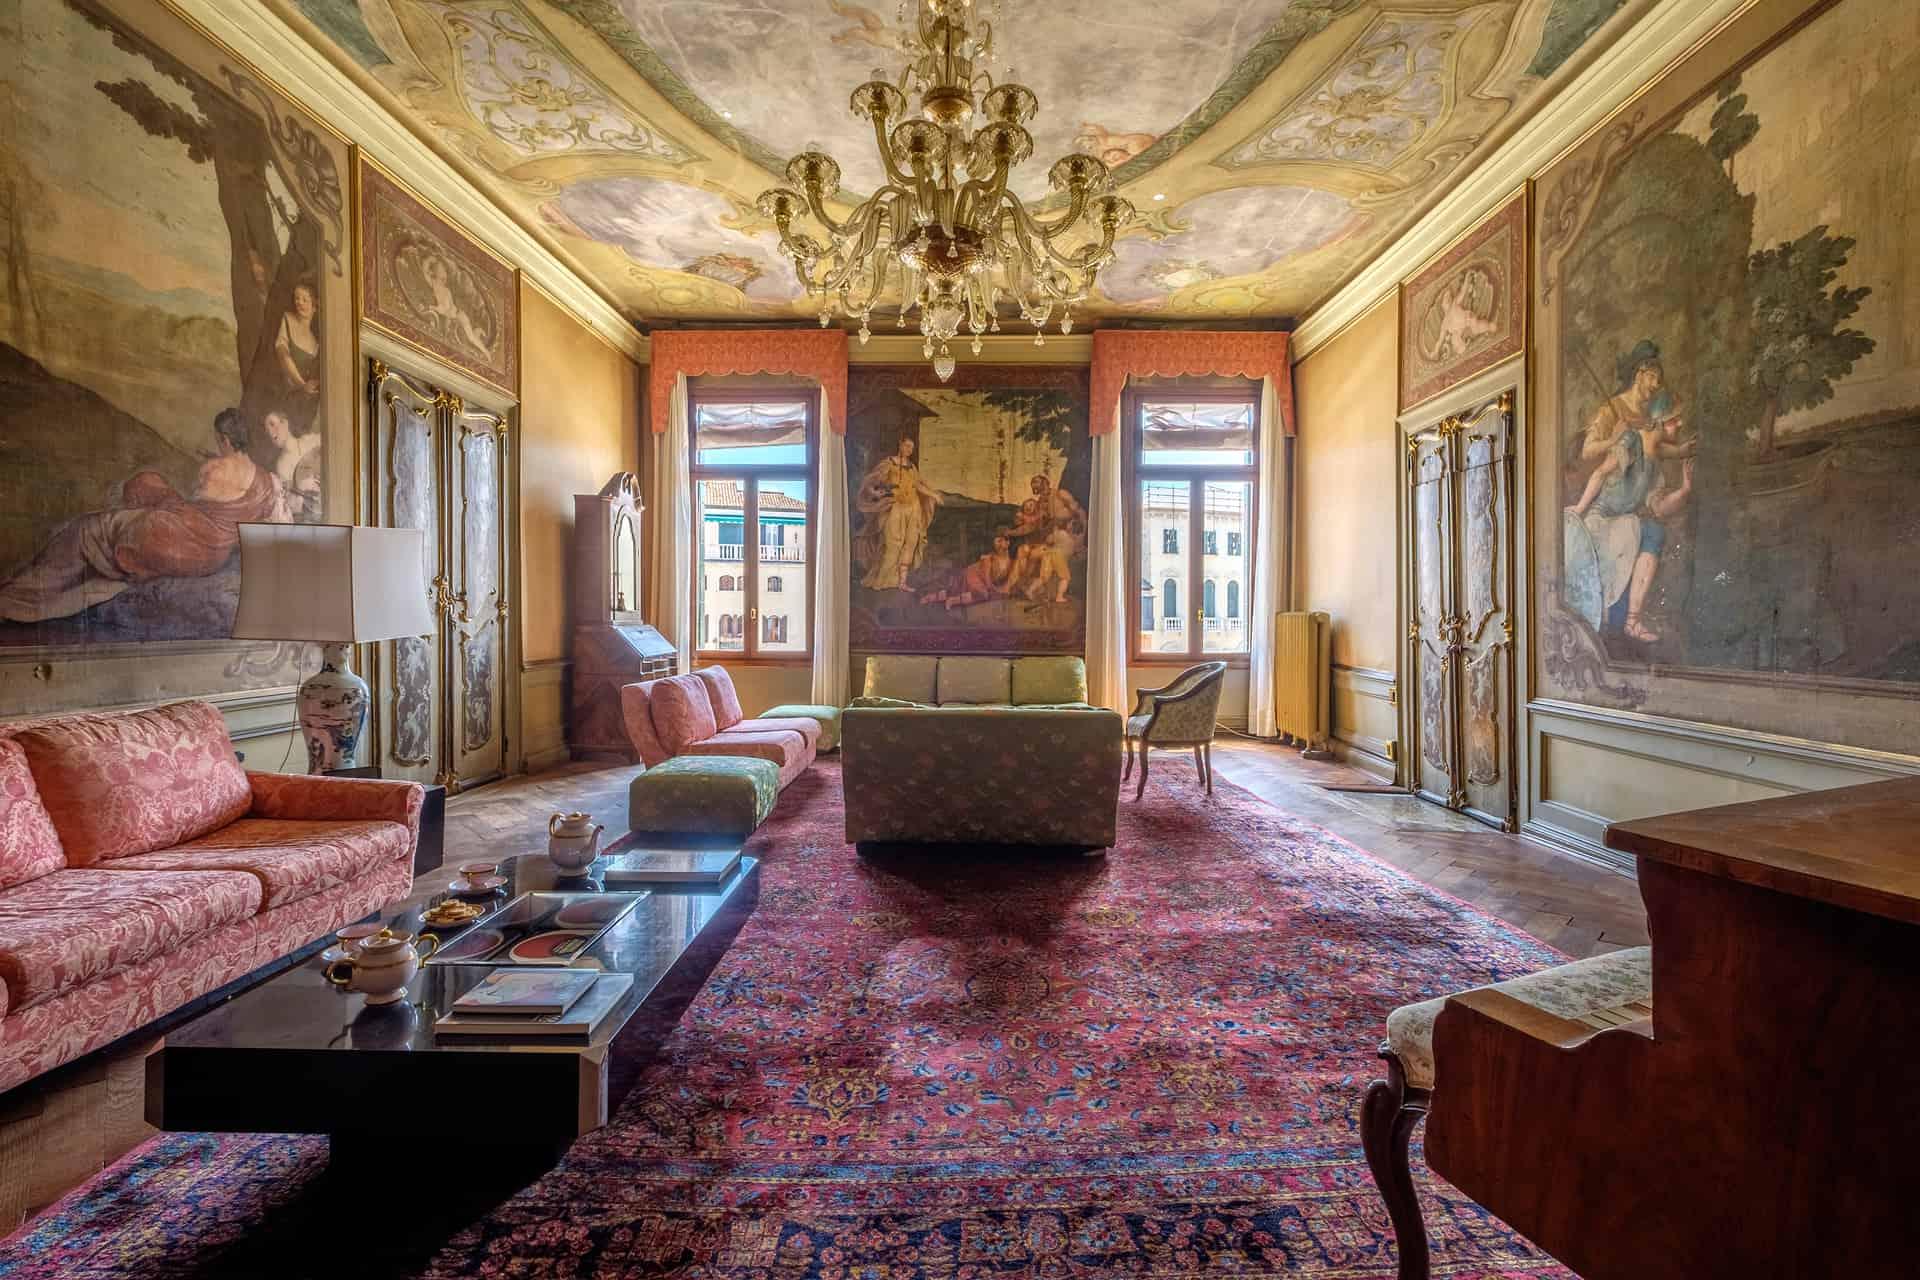 Luminous living room with original frescoes and antique Venetian furnishing - Ca' Affresco 1 Apartment